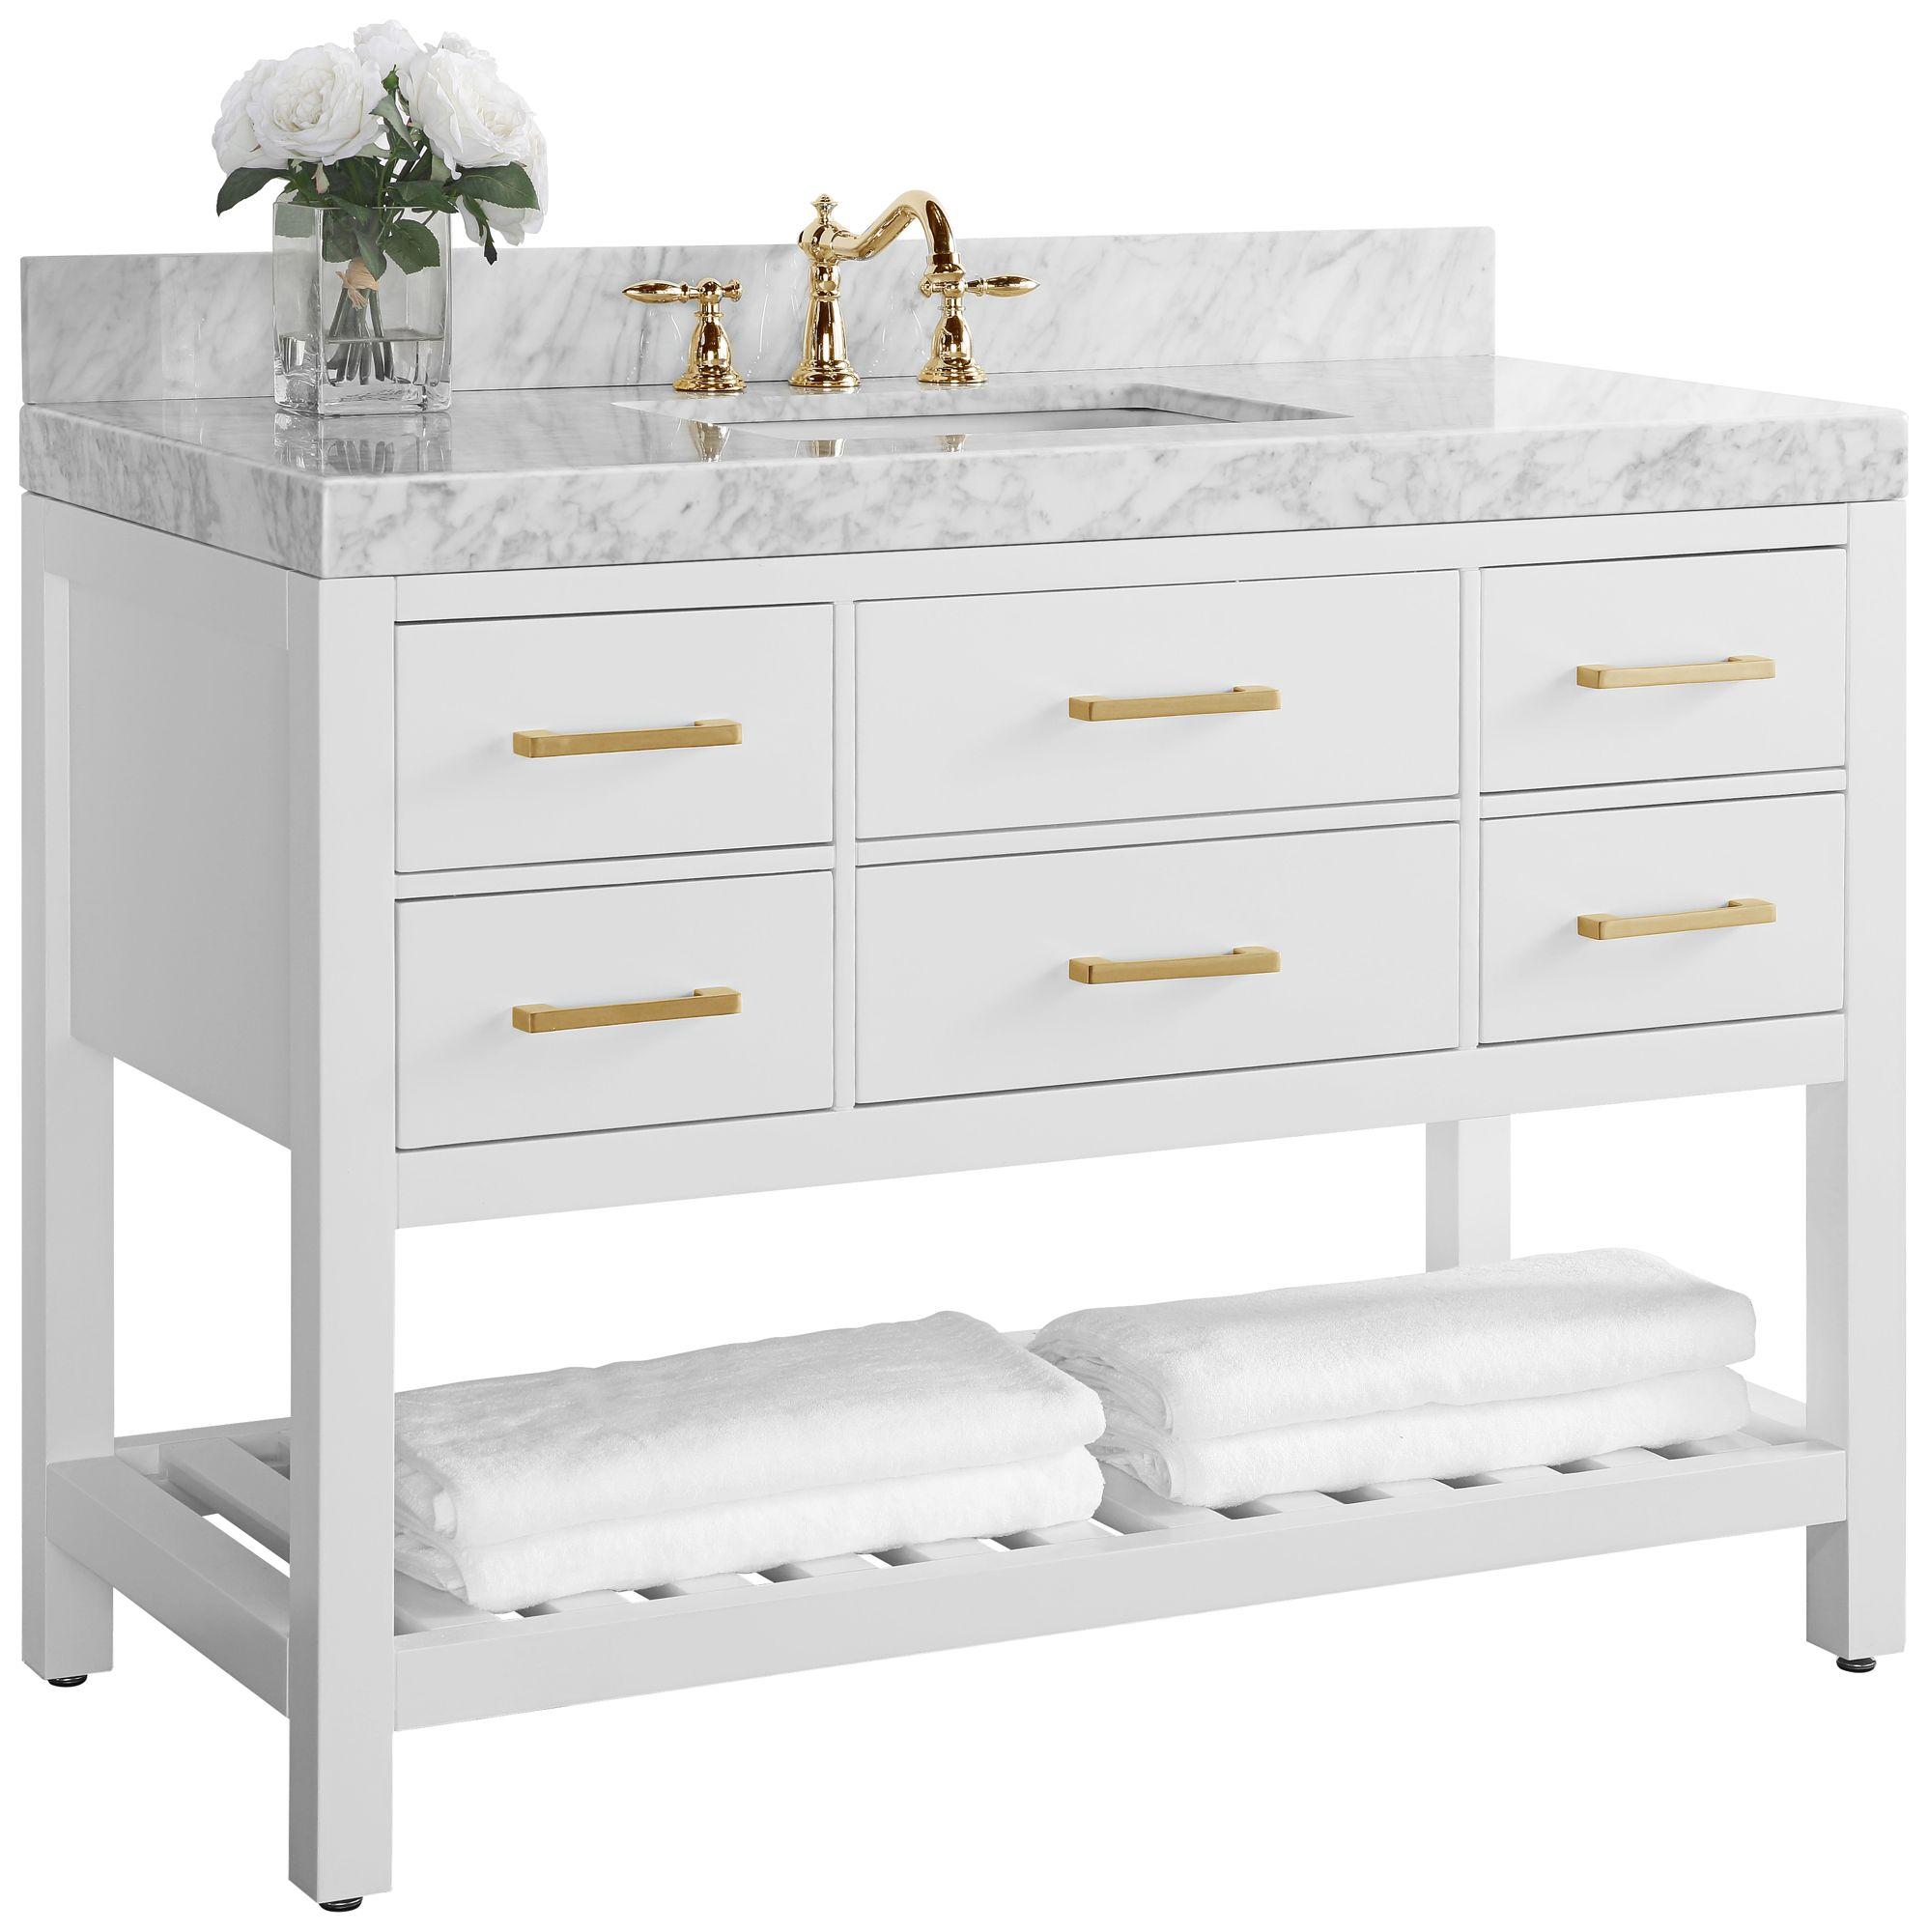 elizabeth 48 w gold hardware white marble single sink vanity